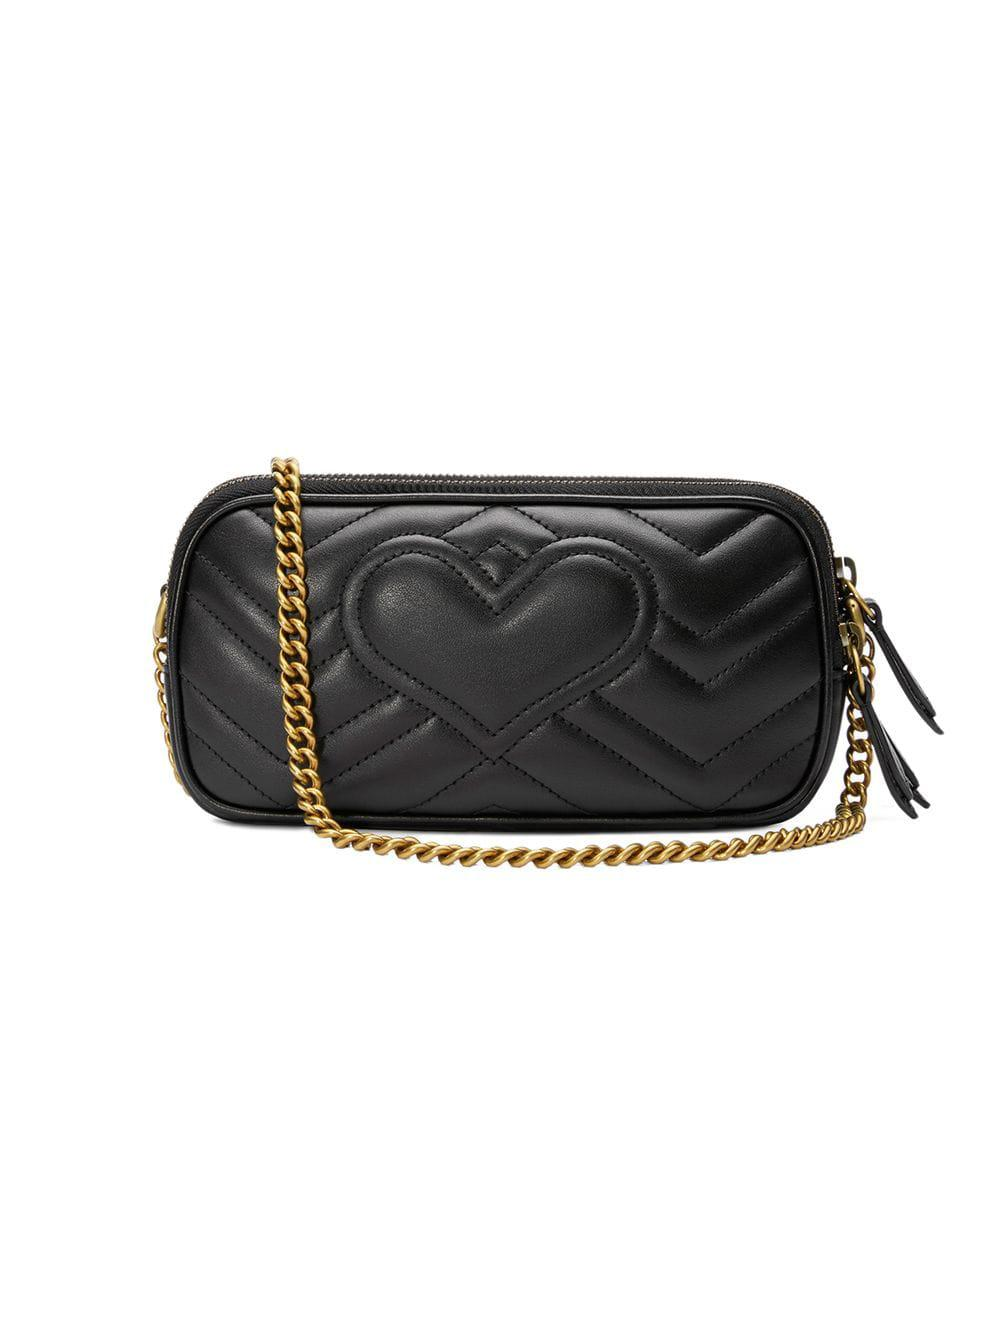 ea1ec454aa56 Gucci GG Marmont Mini Chain Bag in Black - Lyst